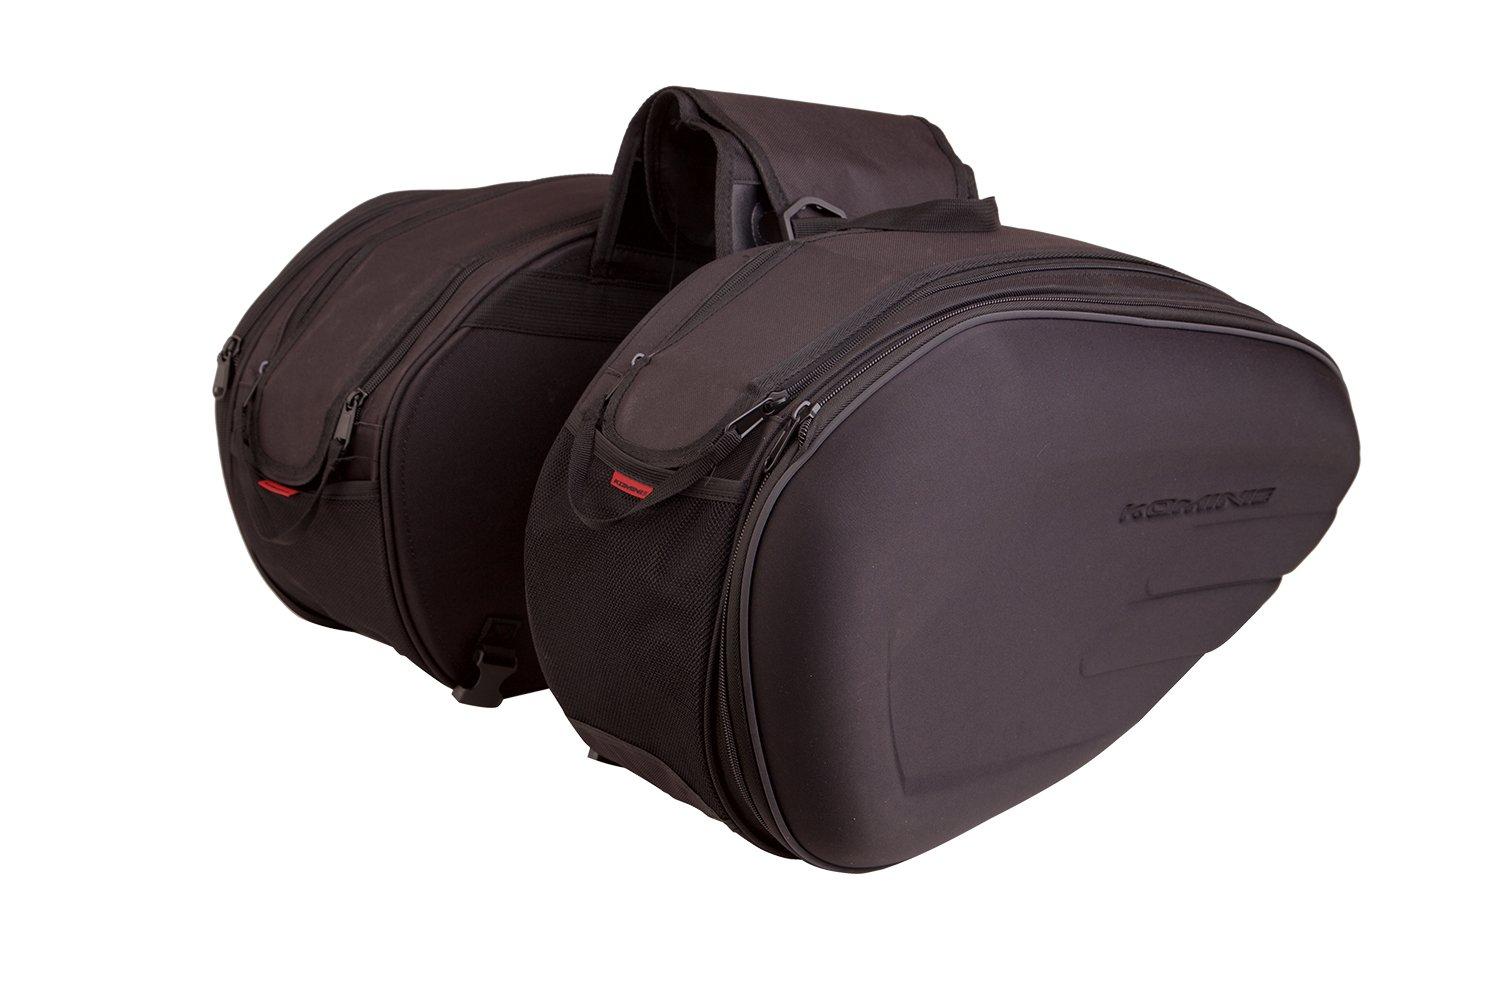 Auto Companion Motorrad-Packtasche Easy (1 Paar), halb starr, mit wasserdichten Ü berzü gen AUTOC-23